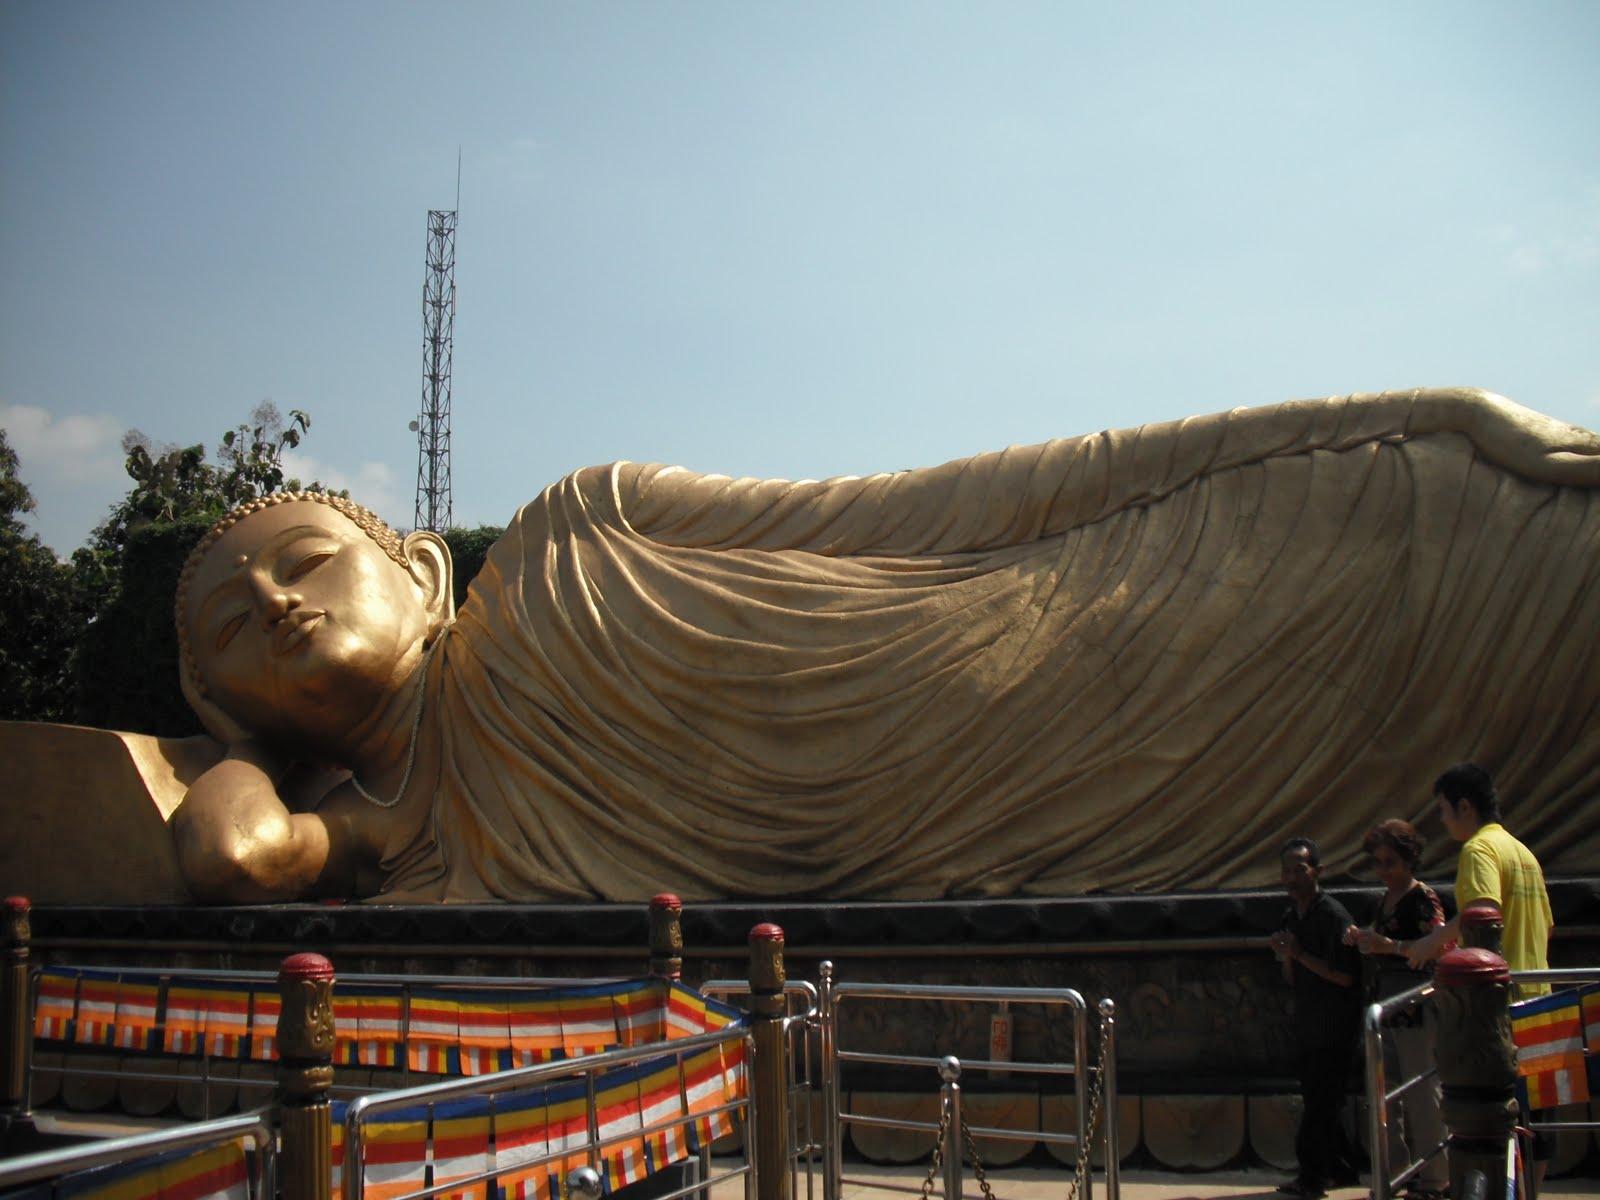 Blog Hurek Mahavihara Majapahit Buddha Tidur Perayaan Waisak Nasional Memang